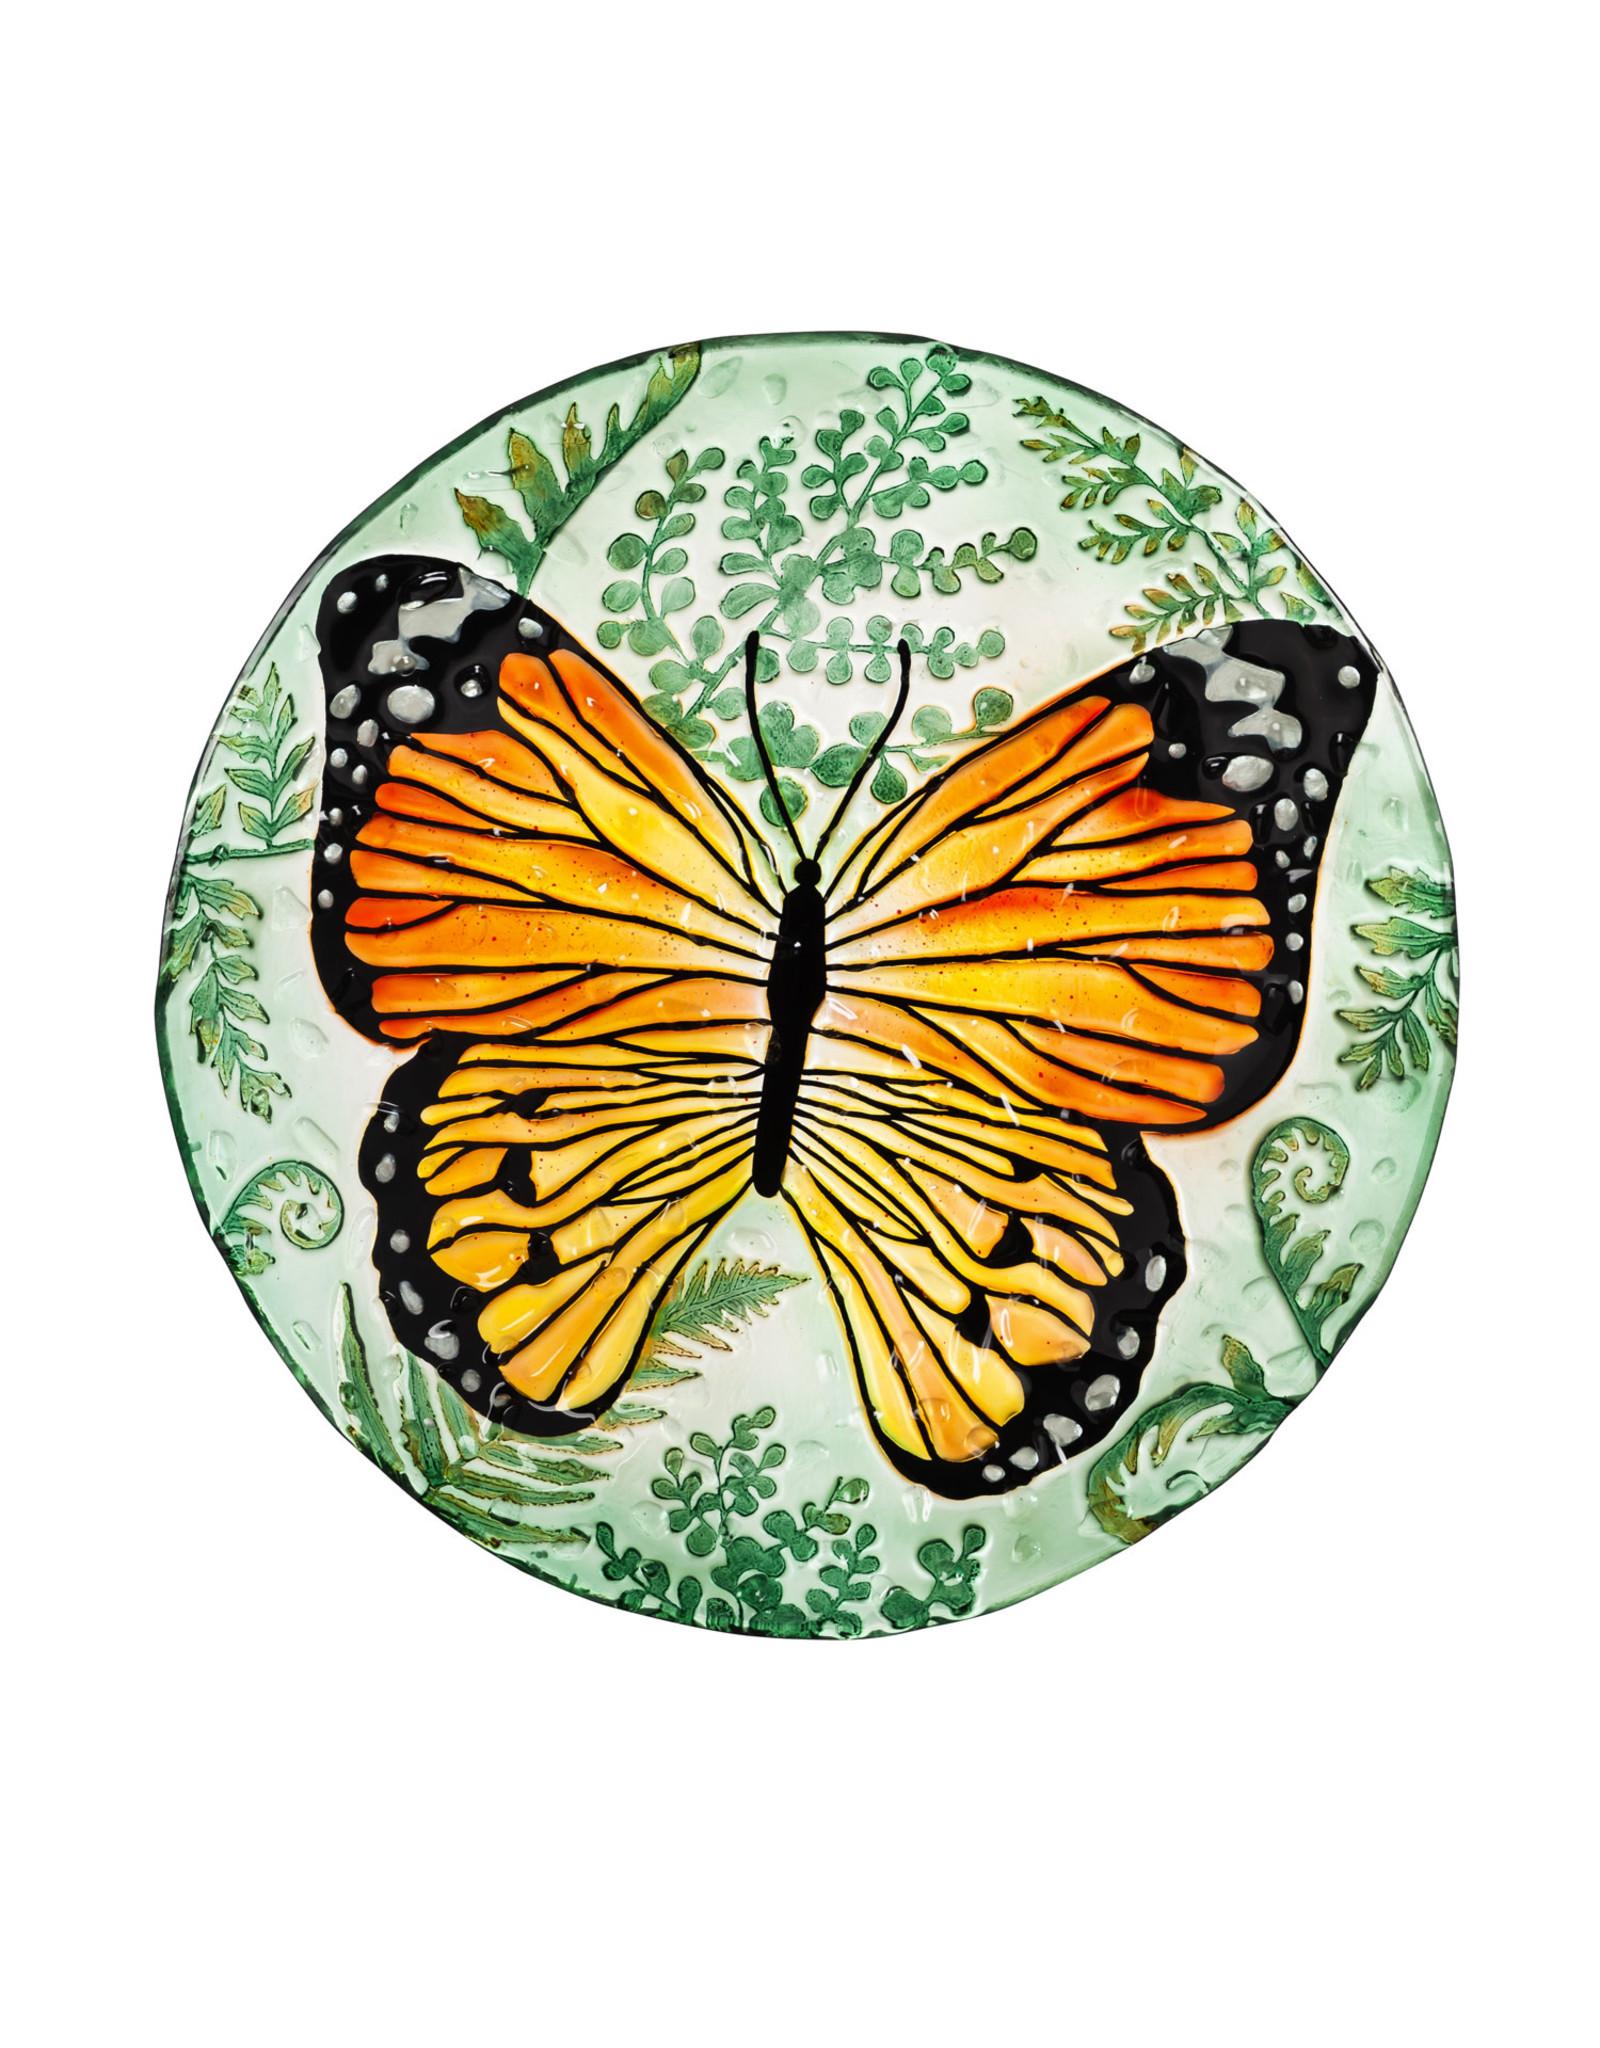 "Evergreen EE2GB6891 18"" HandPainted Birdbath with Crushed Glass, Monarch"